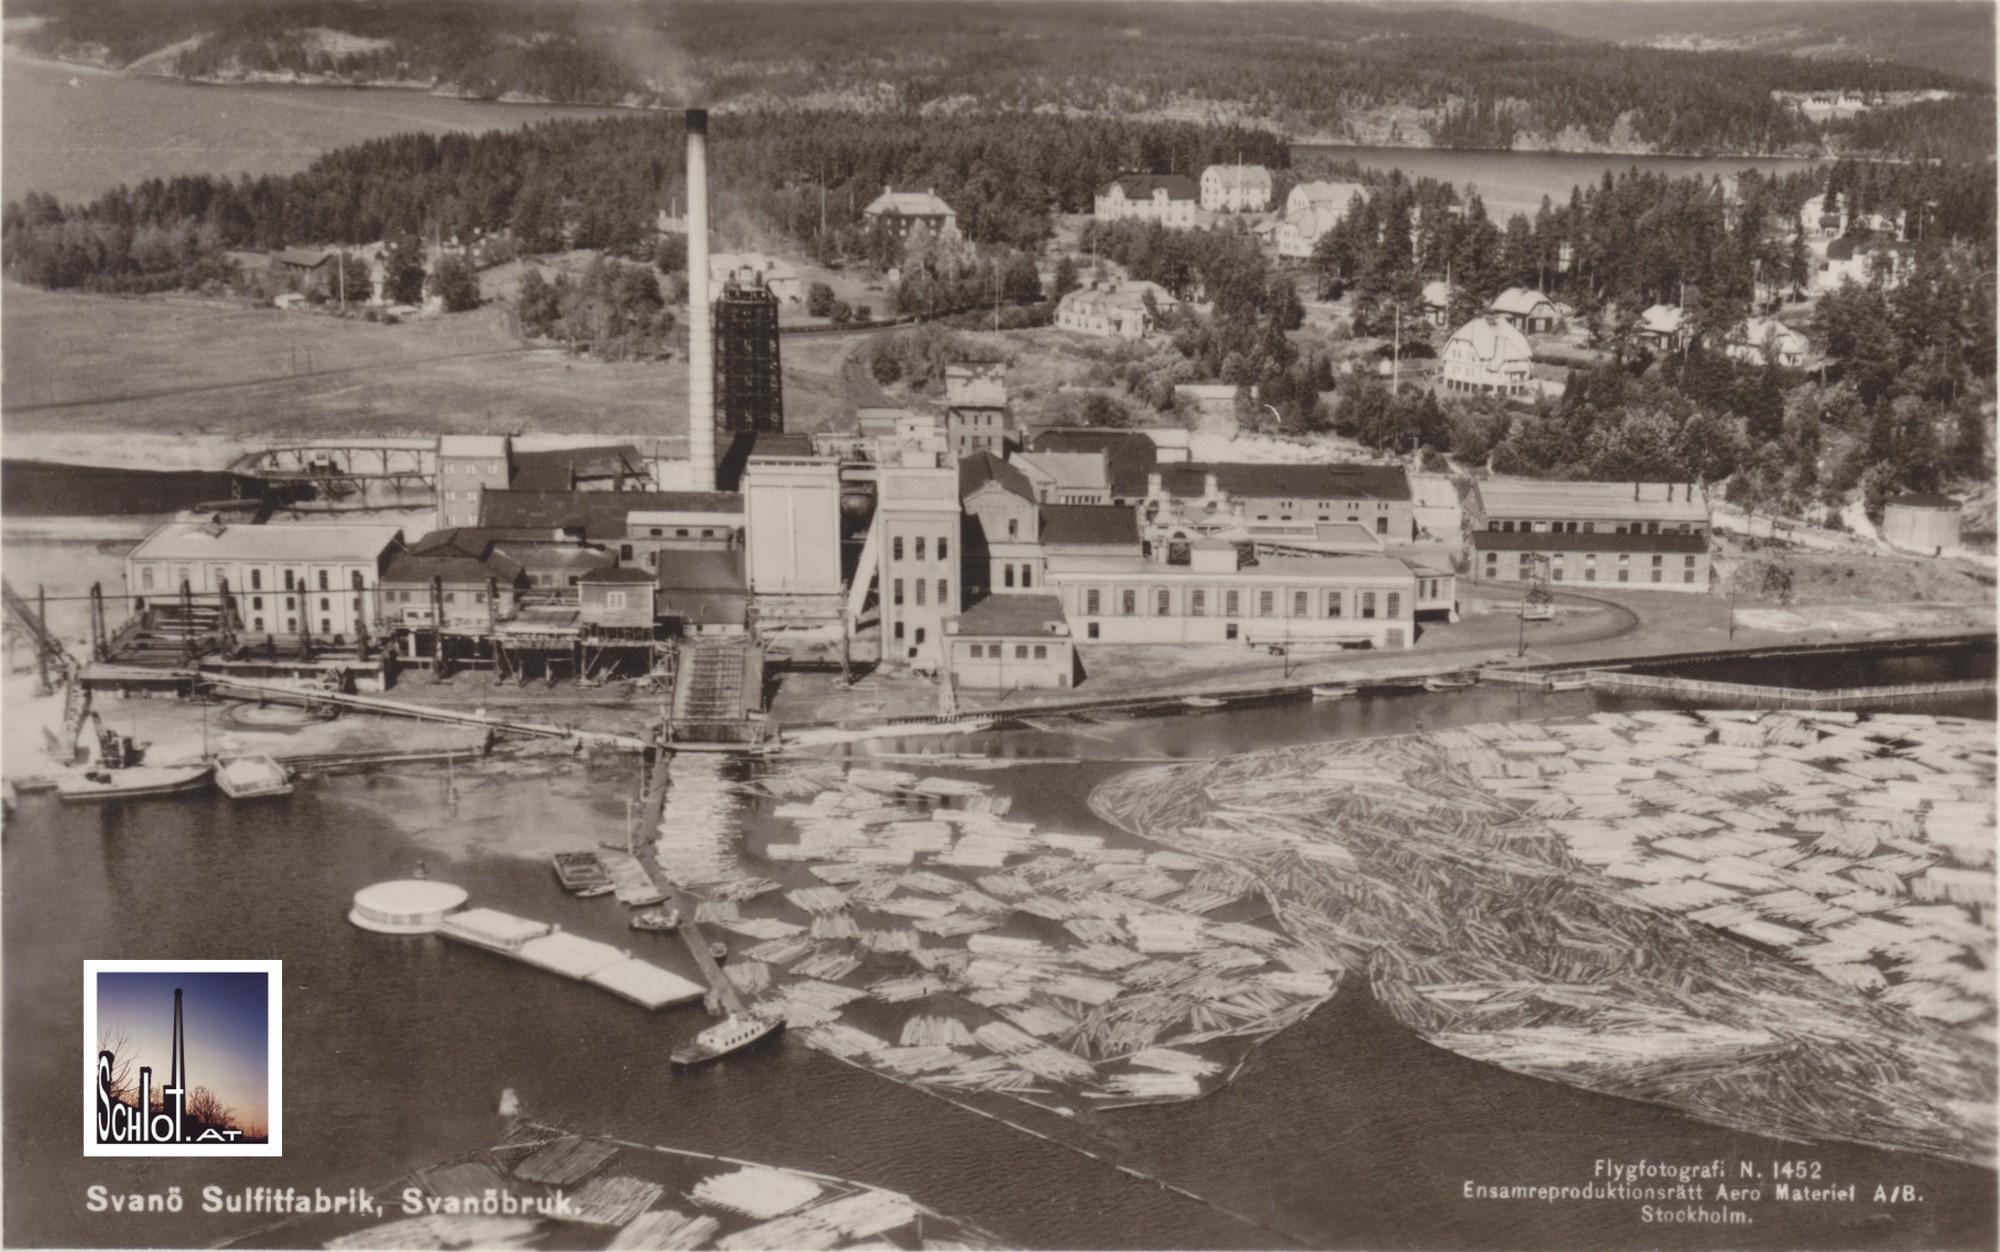 S-Sulfitfabrik_001